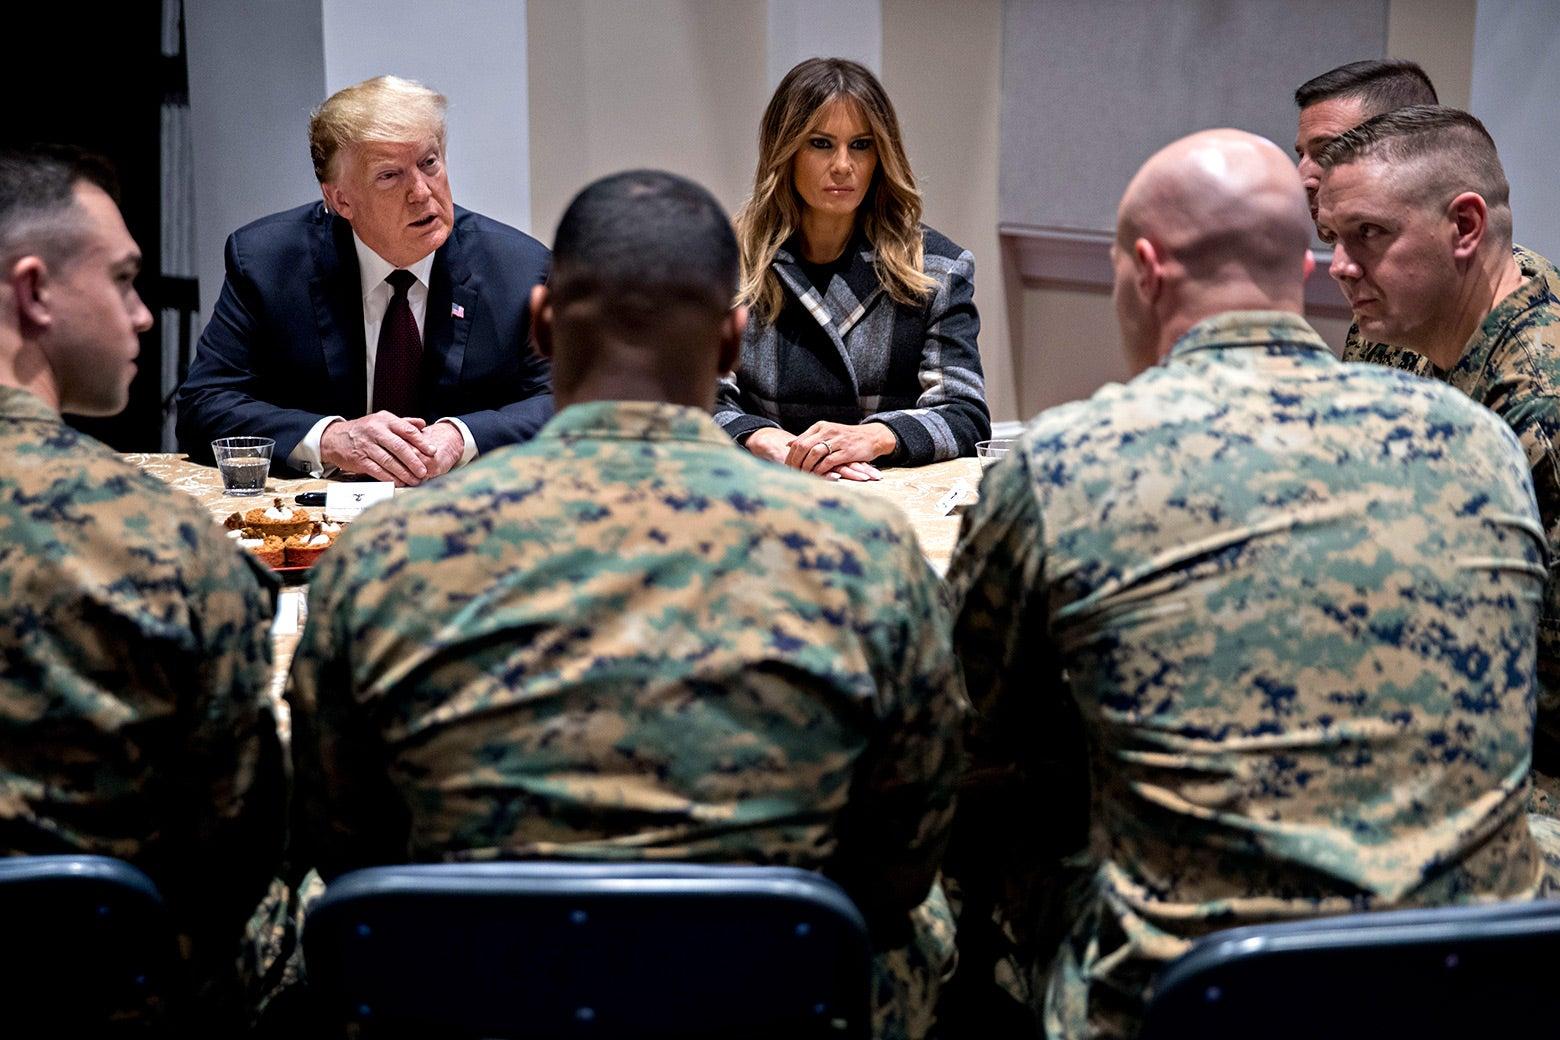 Donald and Melania Trump visit Marines.